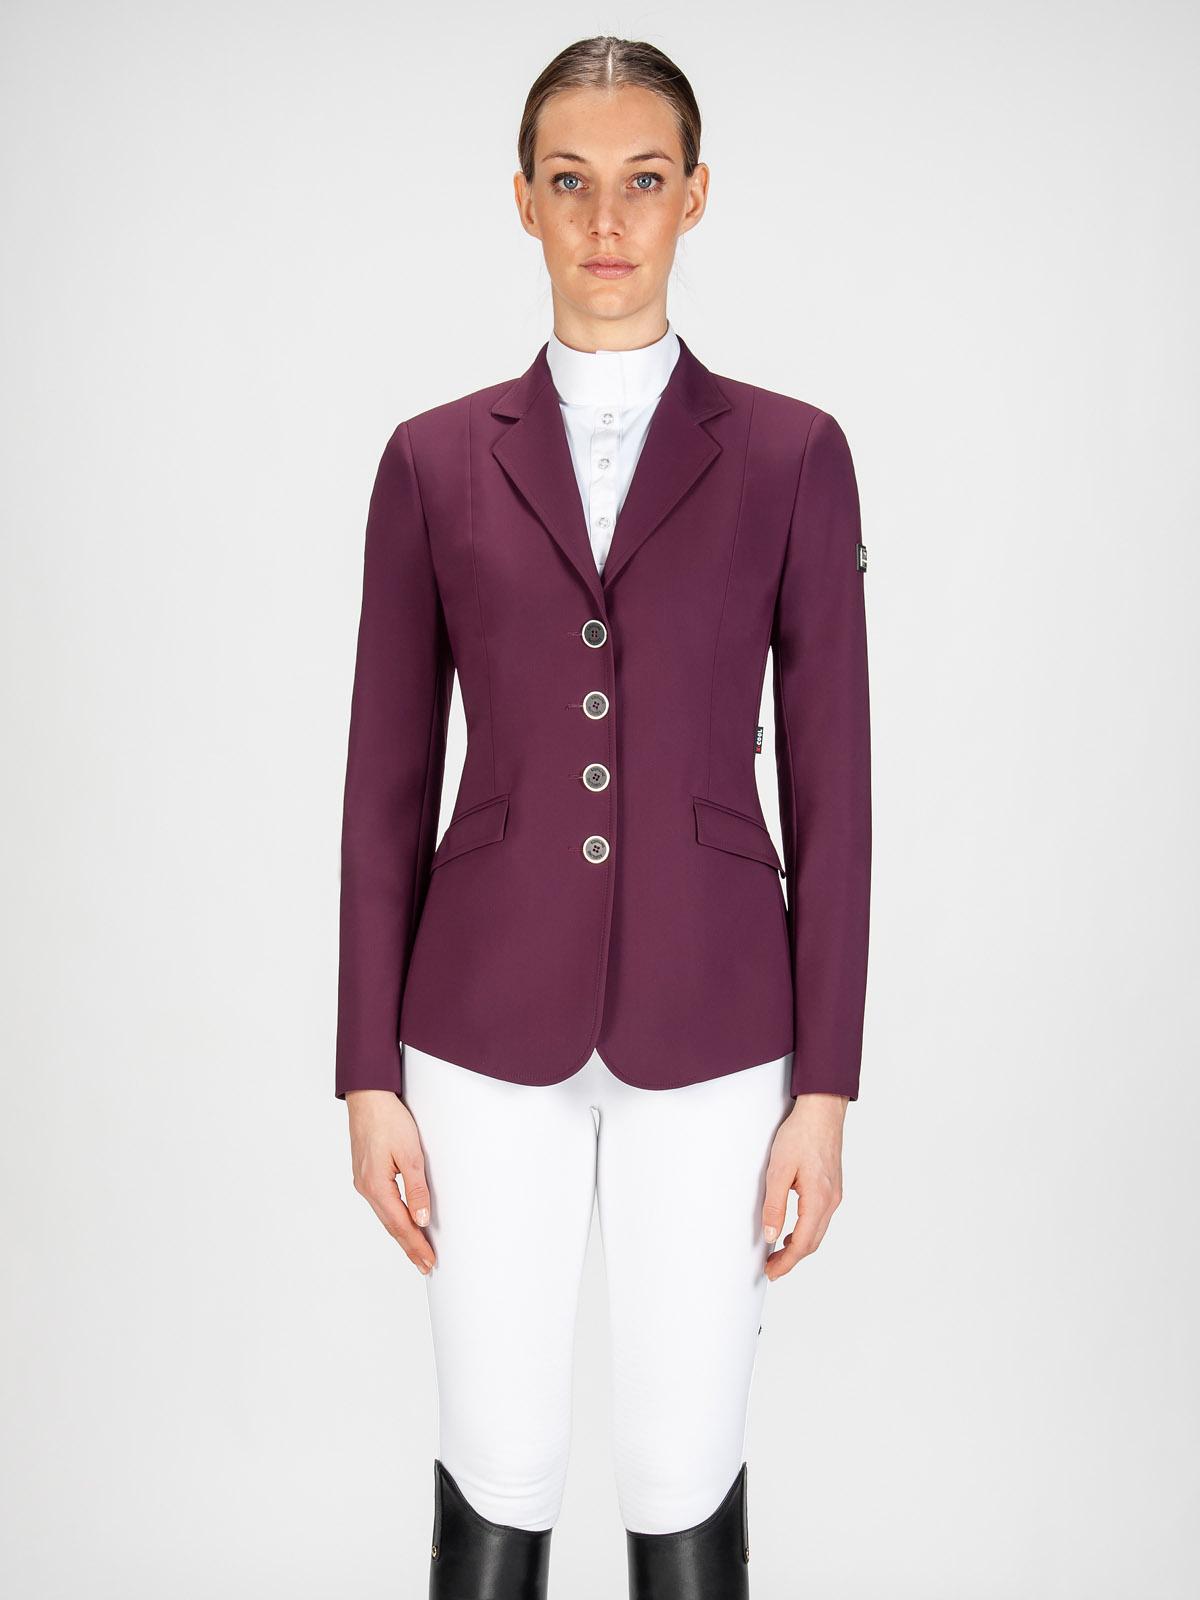 Gait women's show coat in X-Cool Evo performance fabric bordeaux